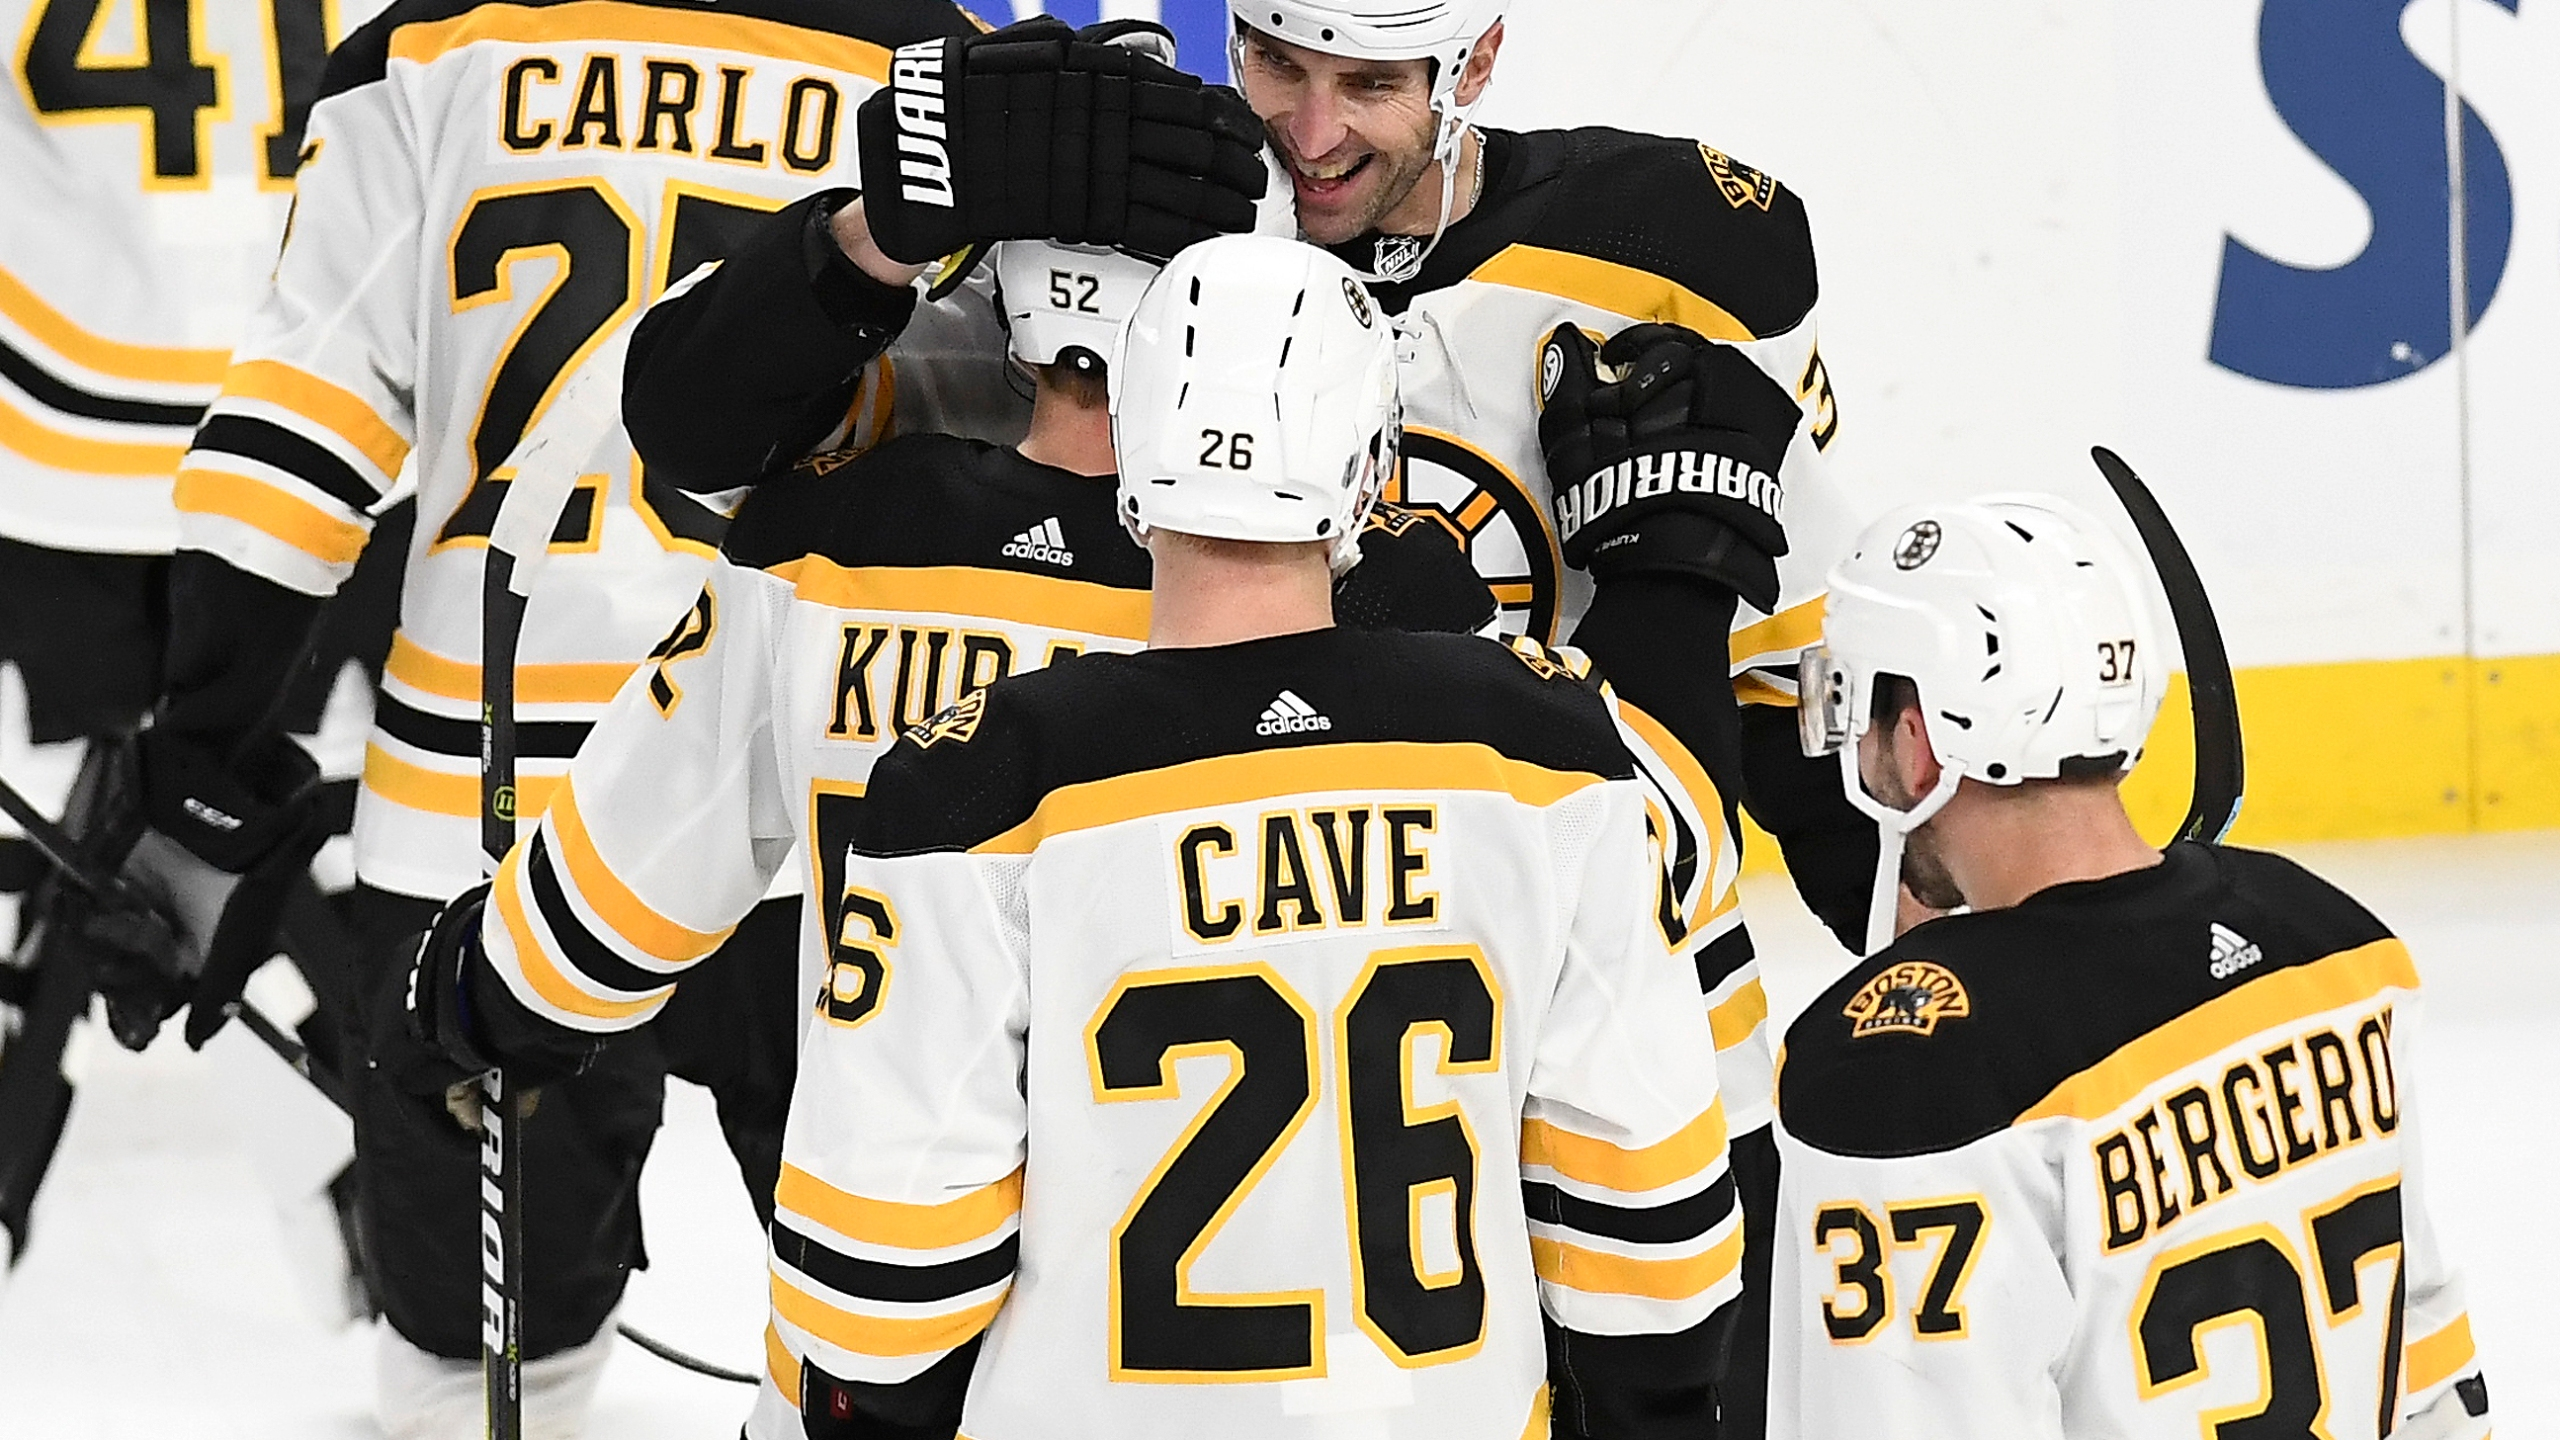 Bruins Sabres Hockey_1546143332805